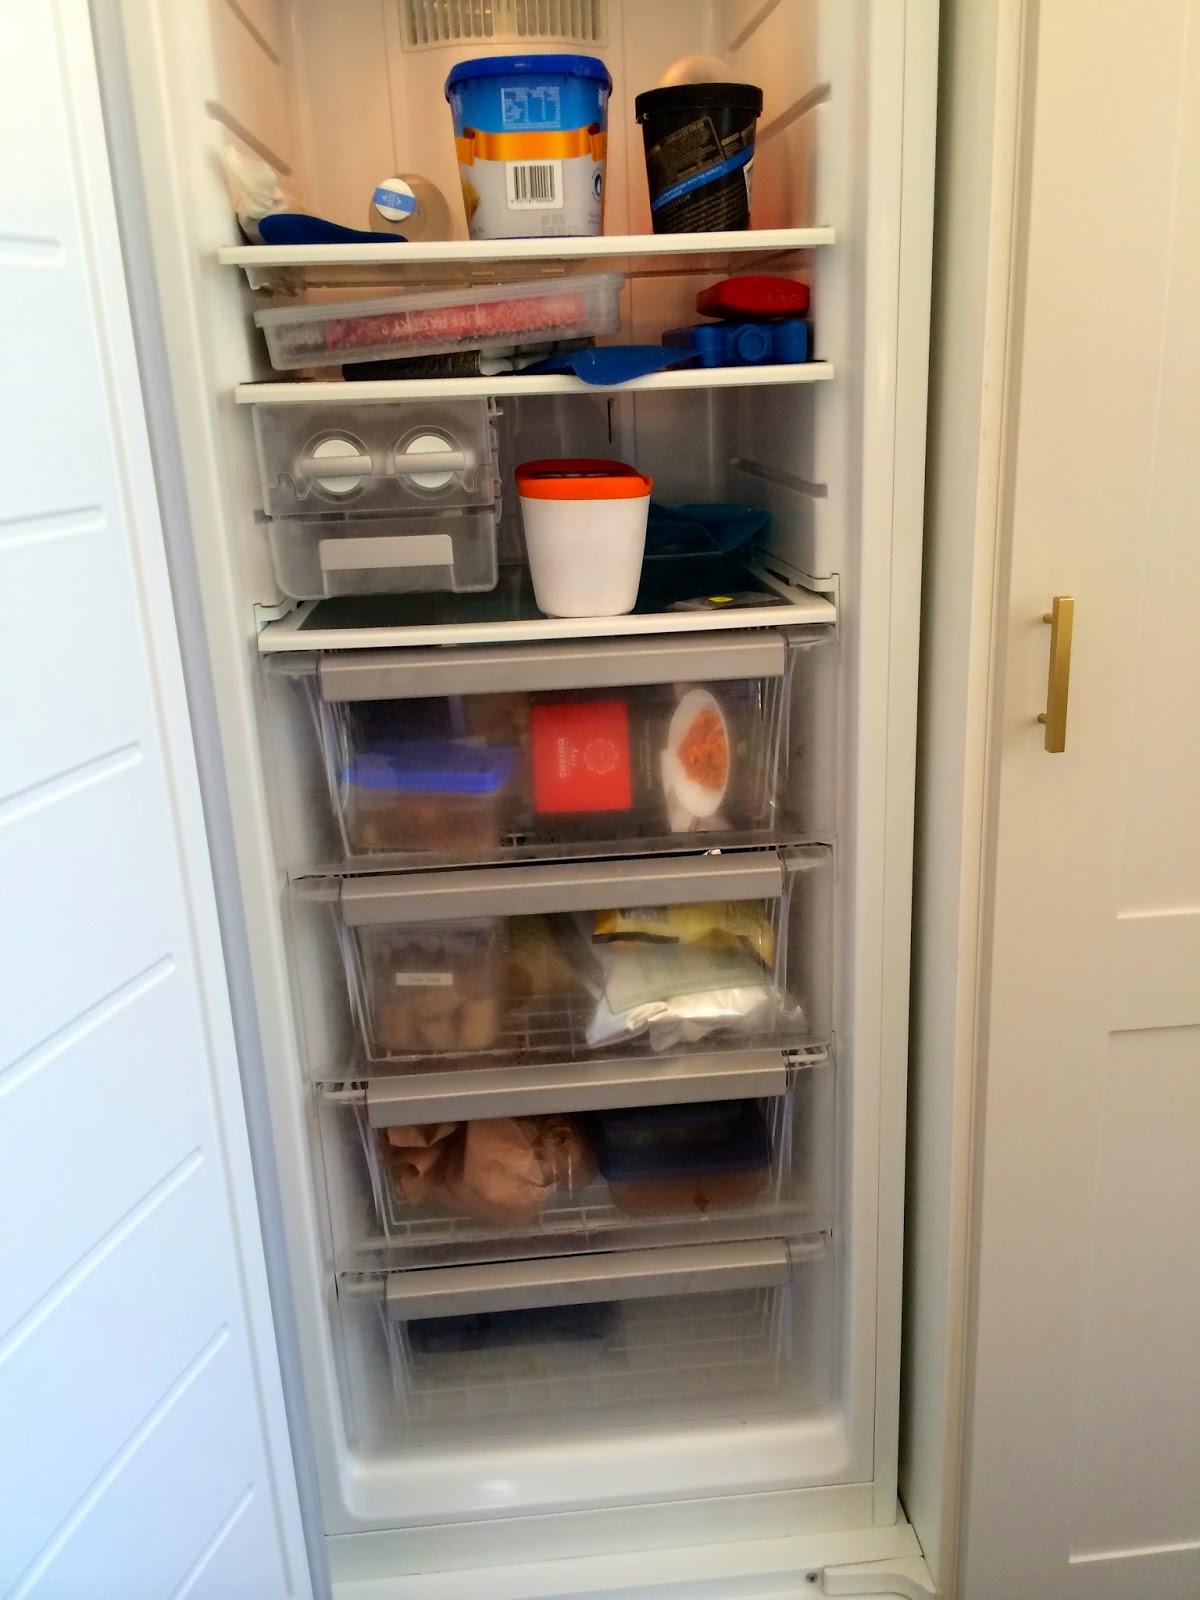 Adelaide Villa: The Kitchen Appliance Review - Siemens, Neff, Perrin ...